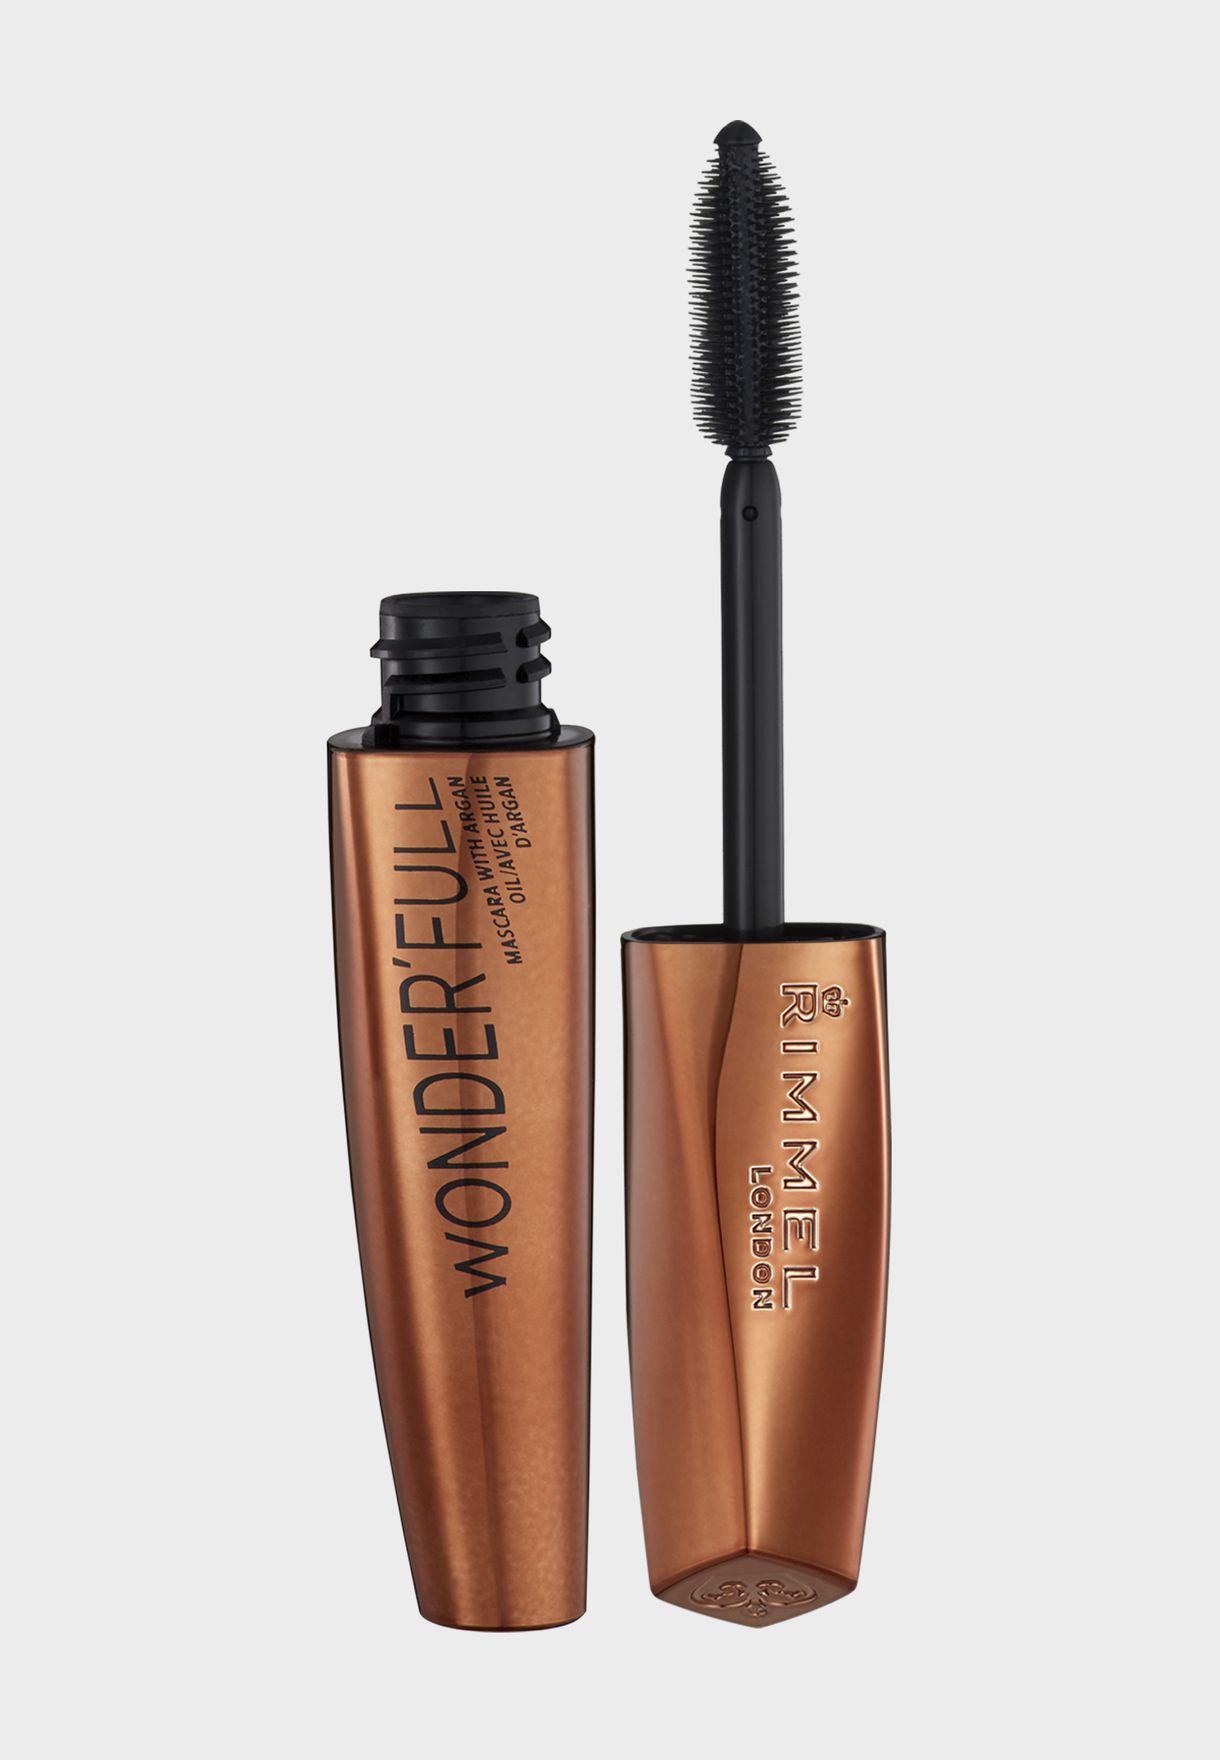 ece6df6e703 Shop Rimmel London black Wonder'full Mascara with Argan Oil ...